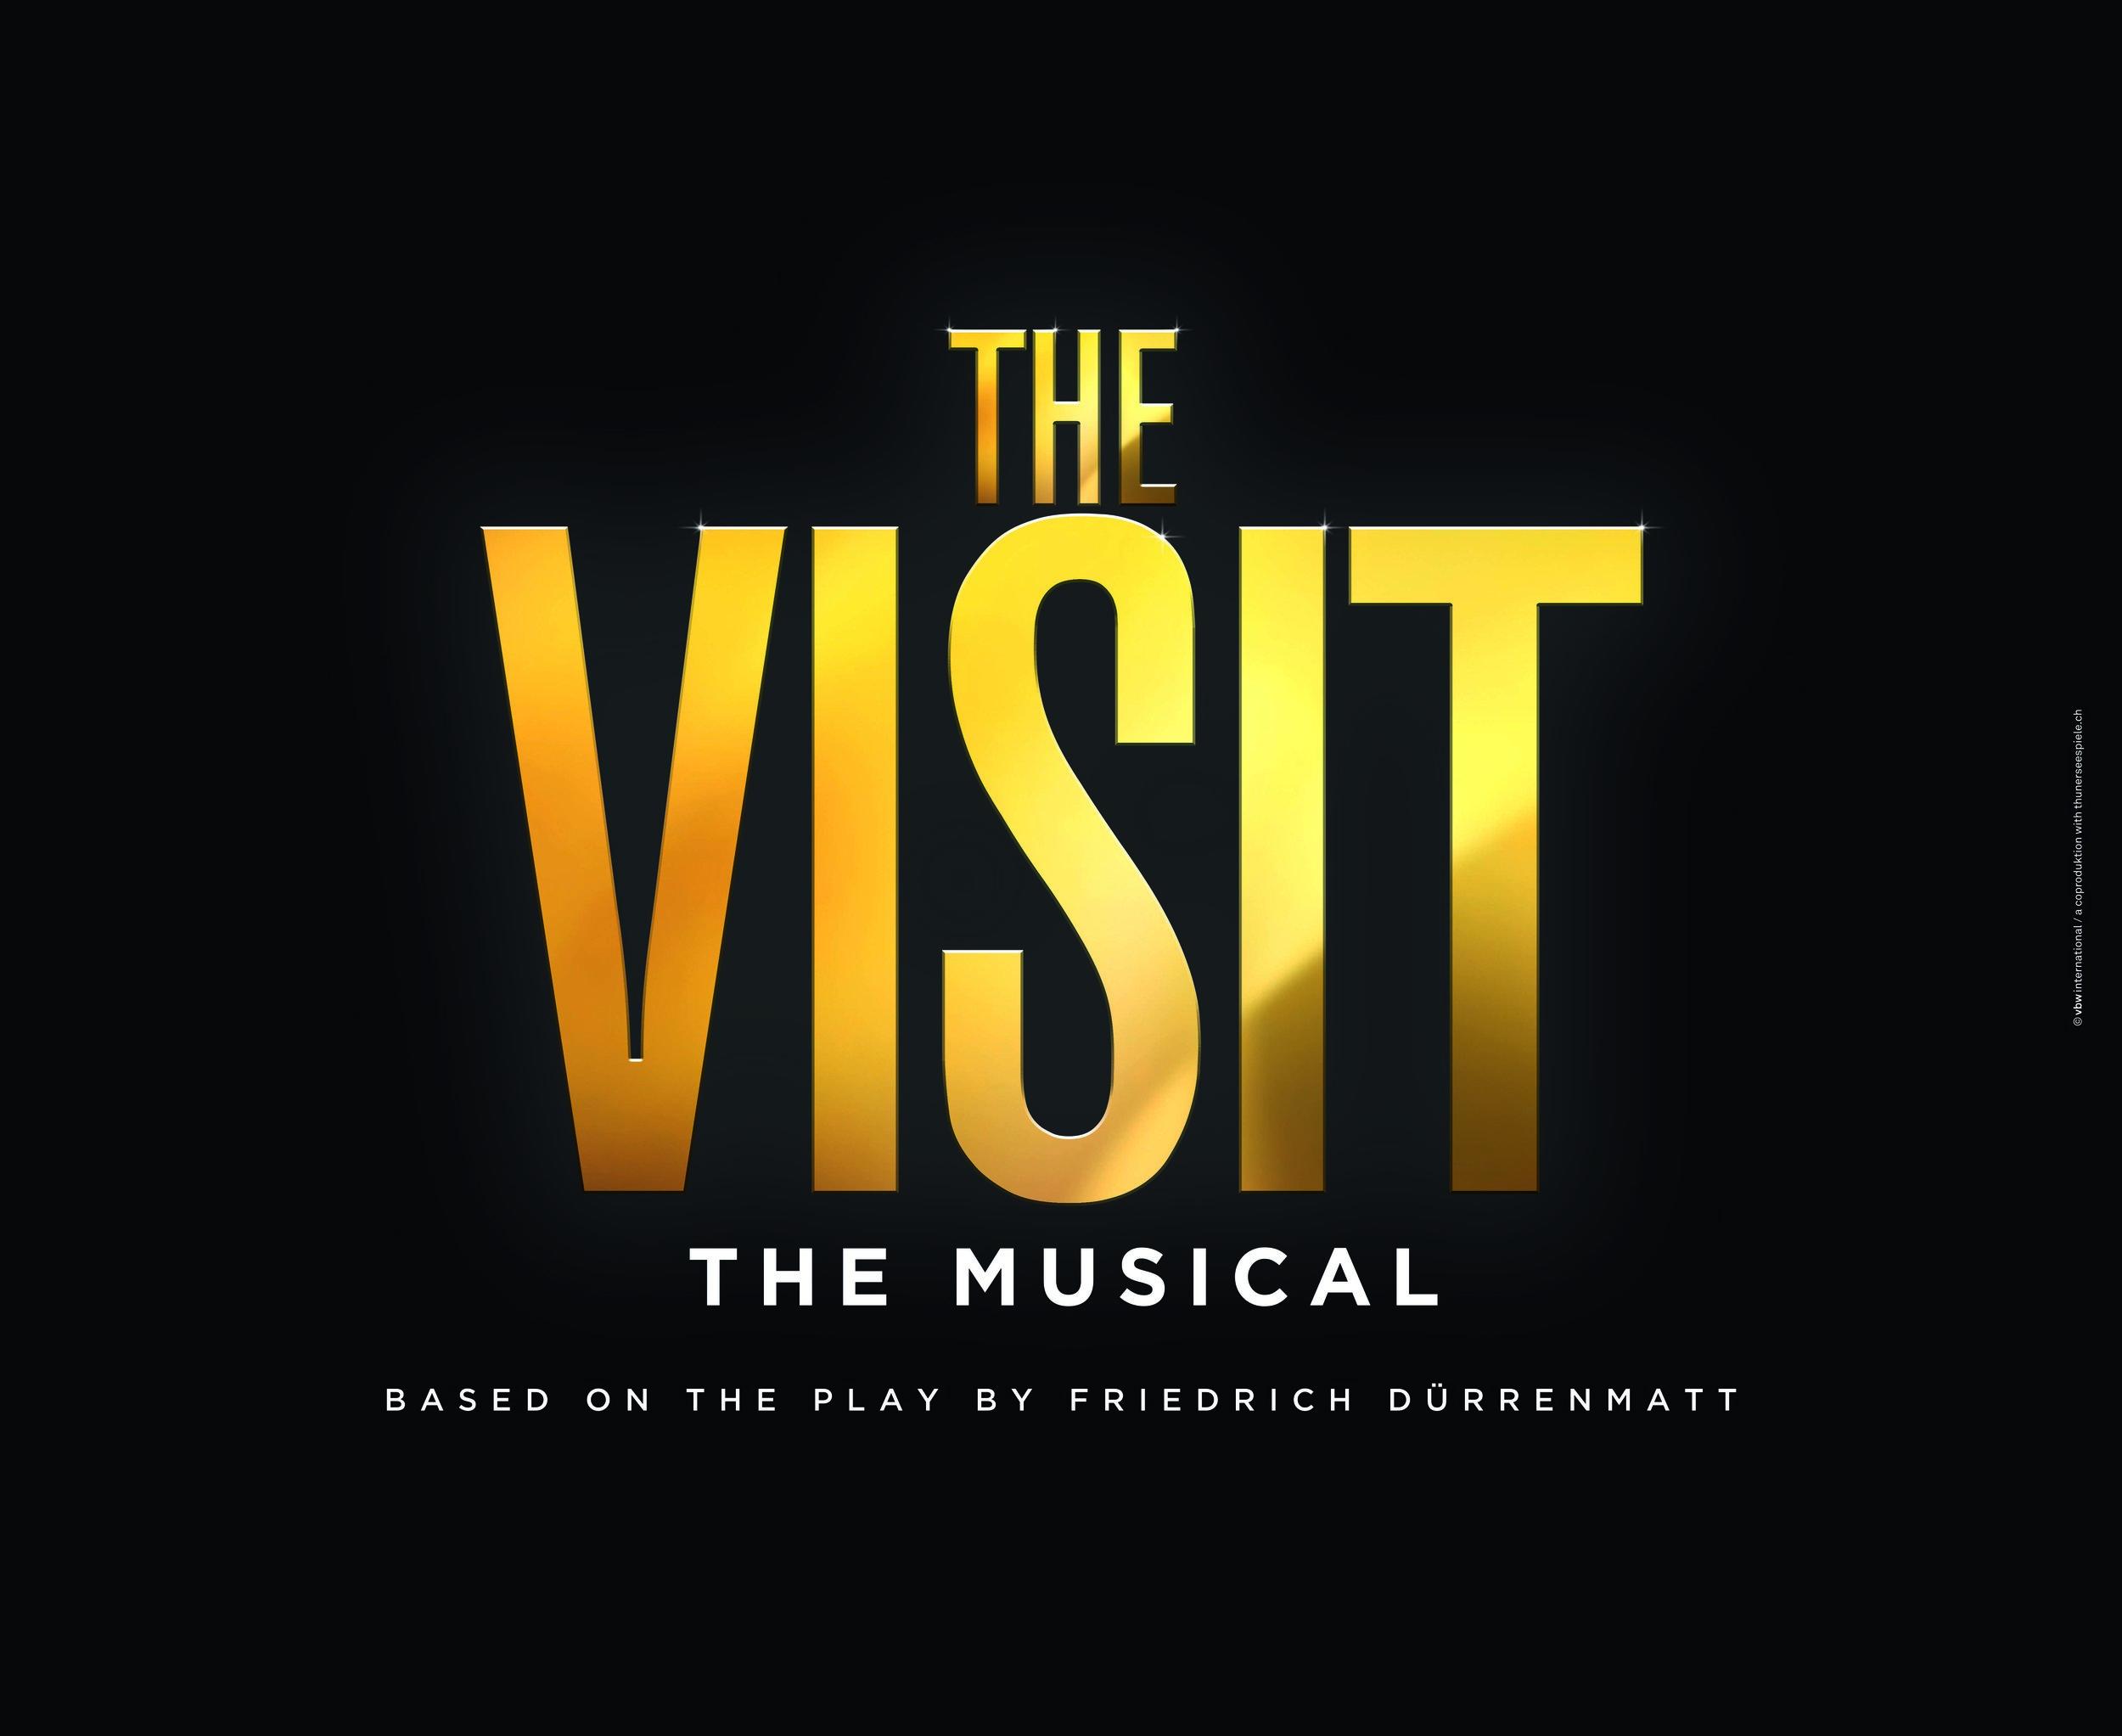 Logo_THE_VISIT.jpg